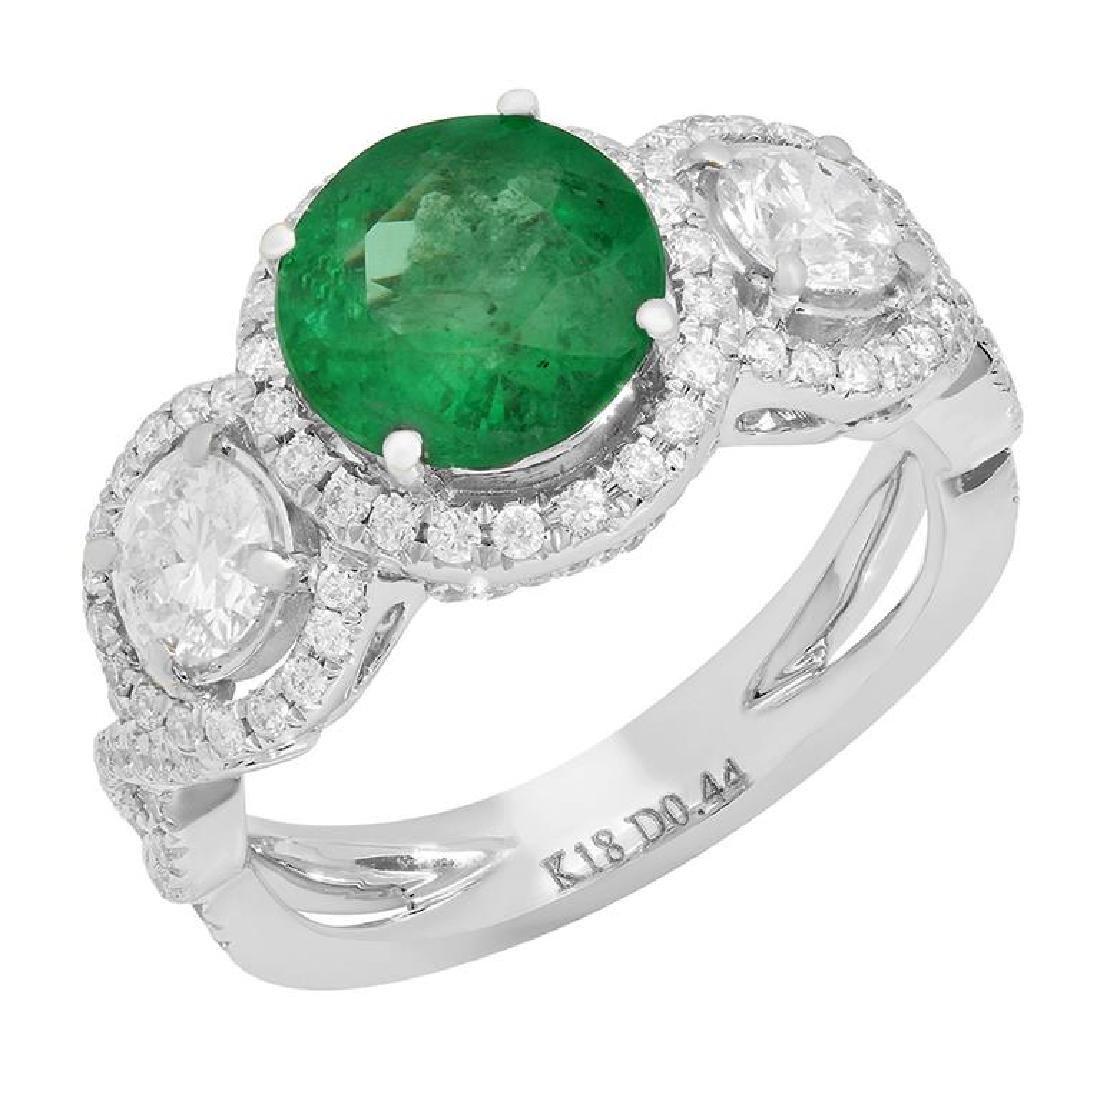 14k White Gold 1.77ct Emerald 1.66ct Diamond Ring